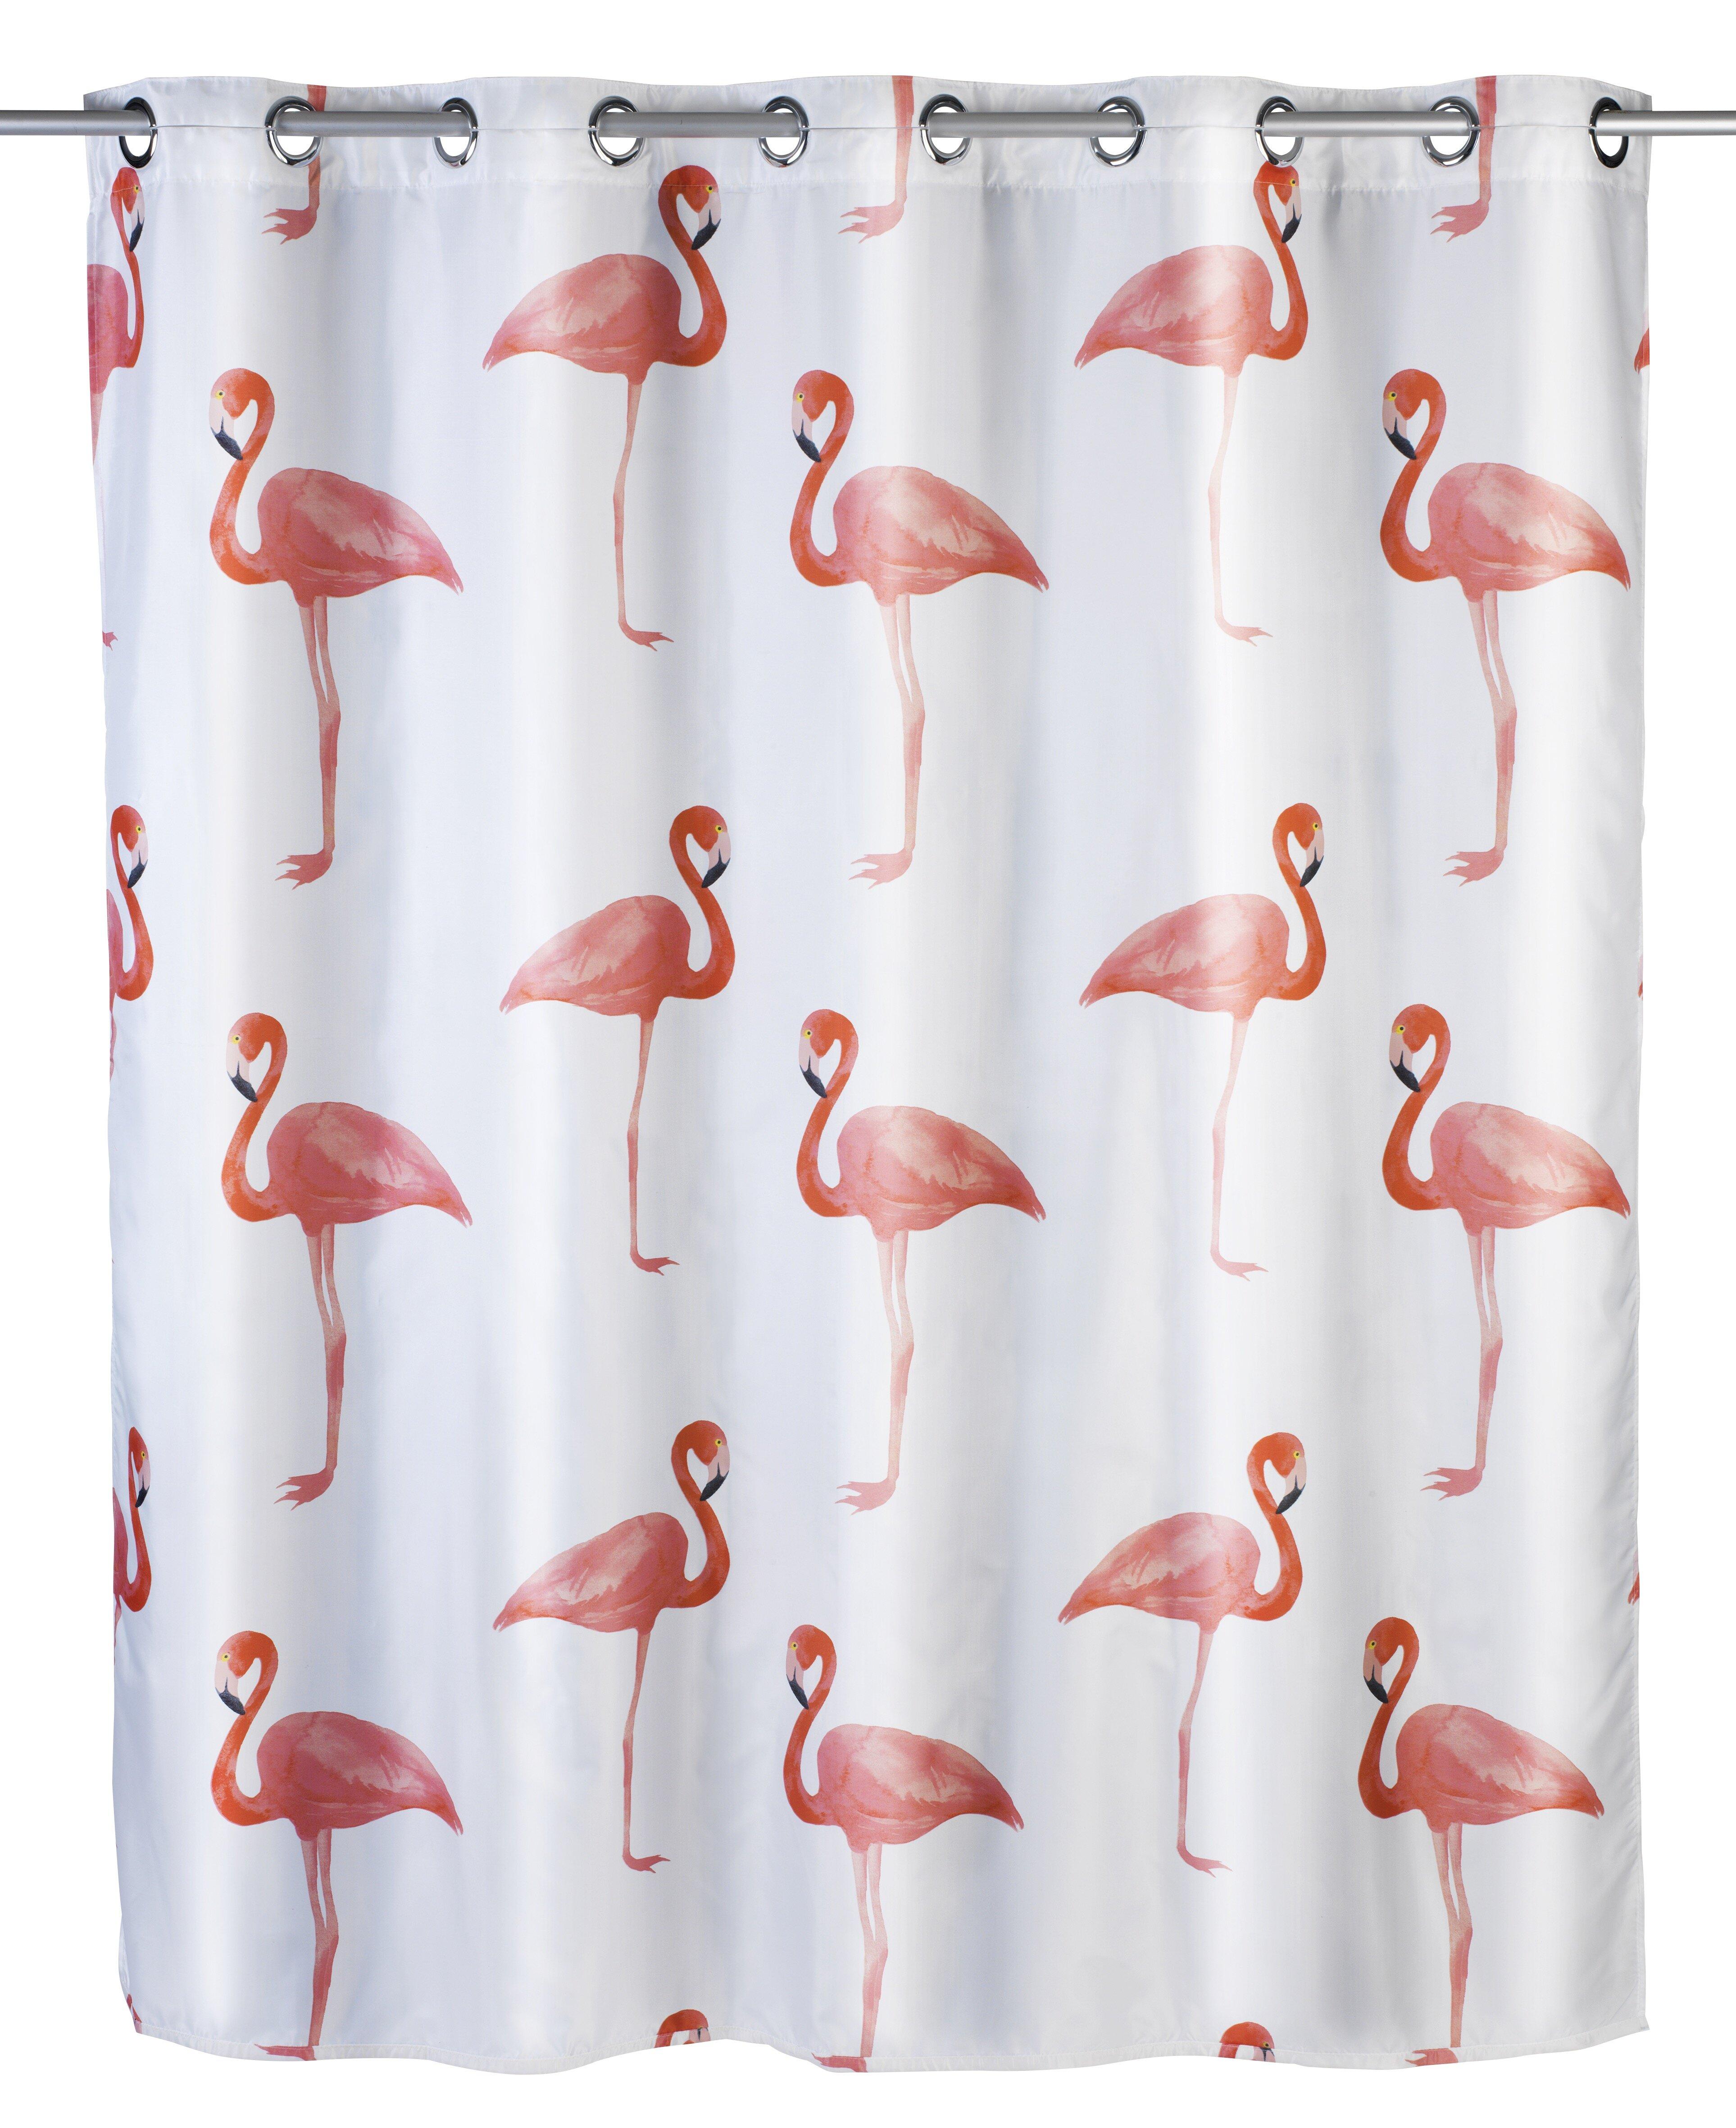 Wenko Flamingo Shower Curtain